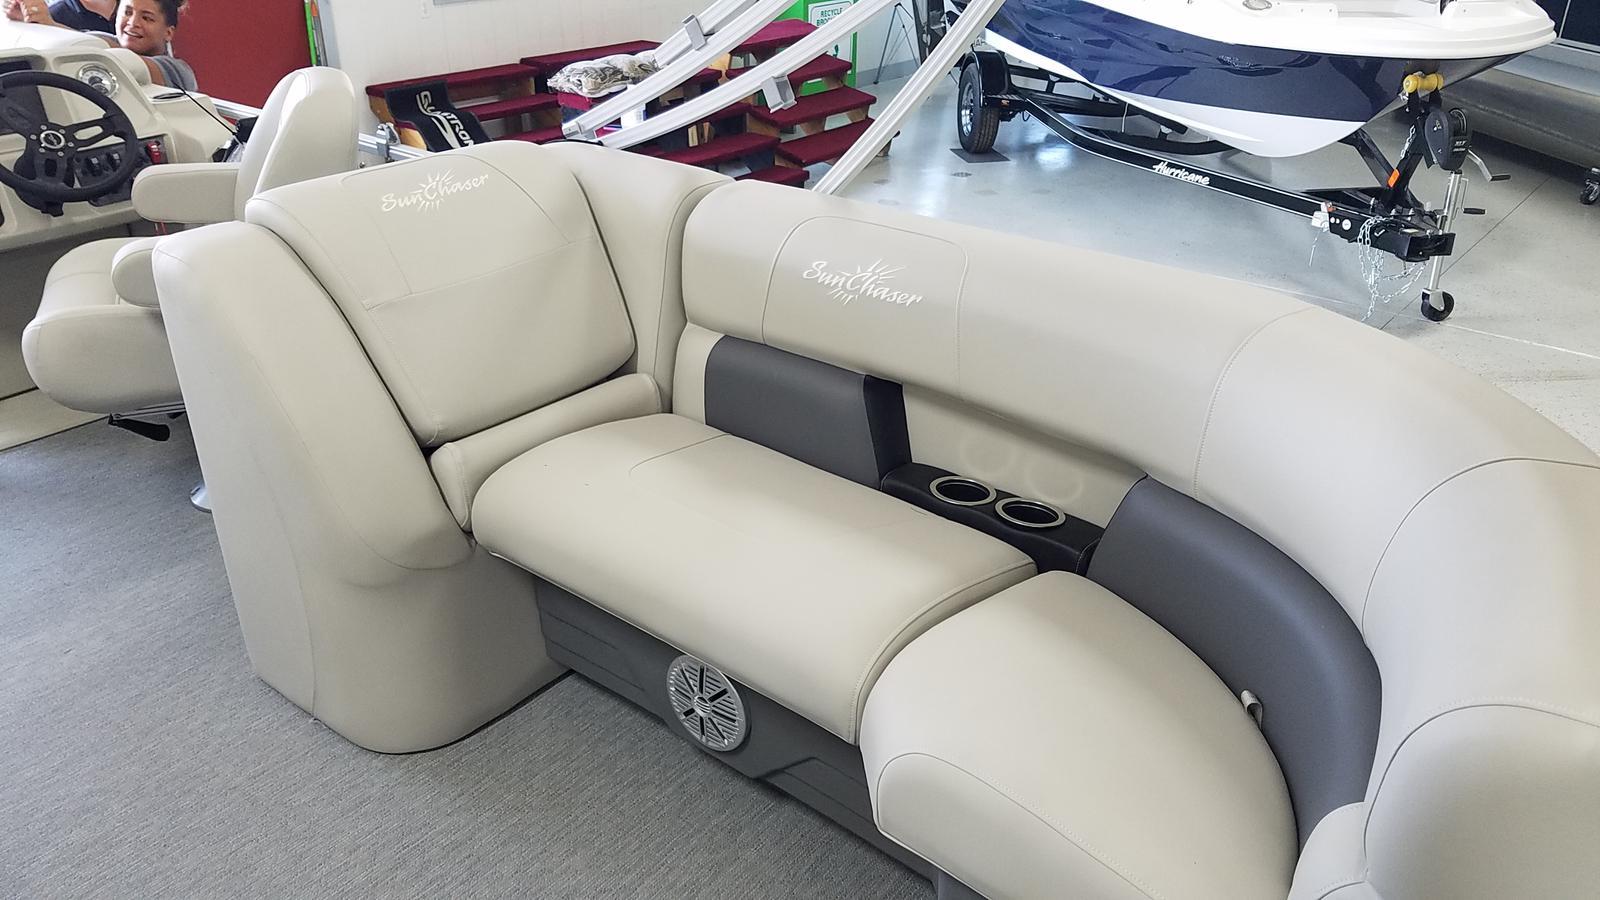 2021 SunChaser boat for sale, model of the boat is Vista 22 LR & Image # 5 of 7